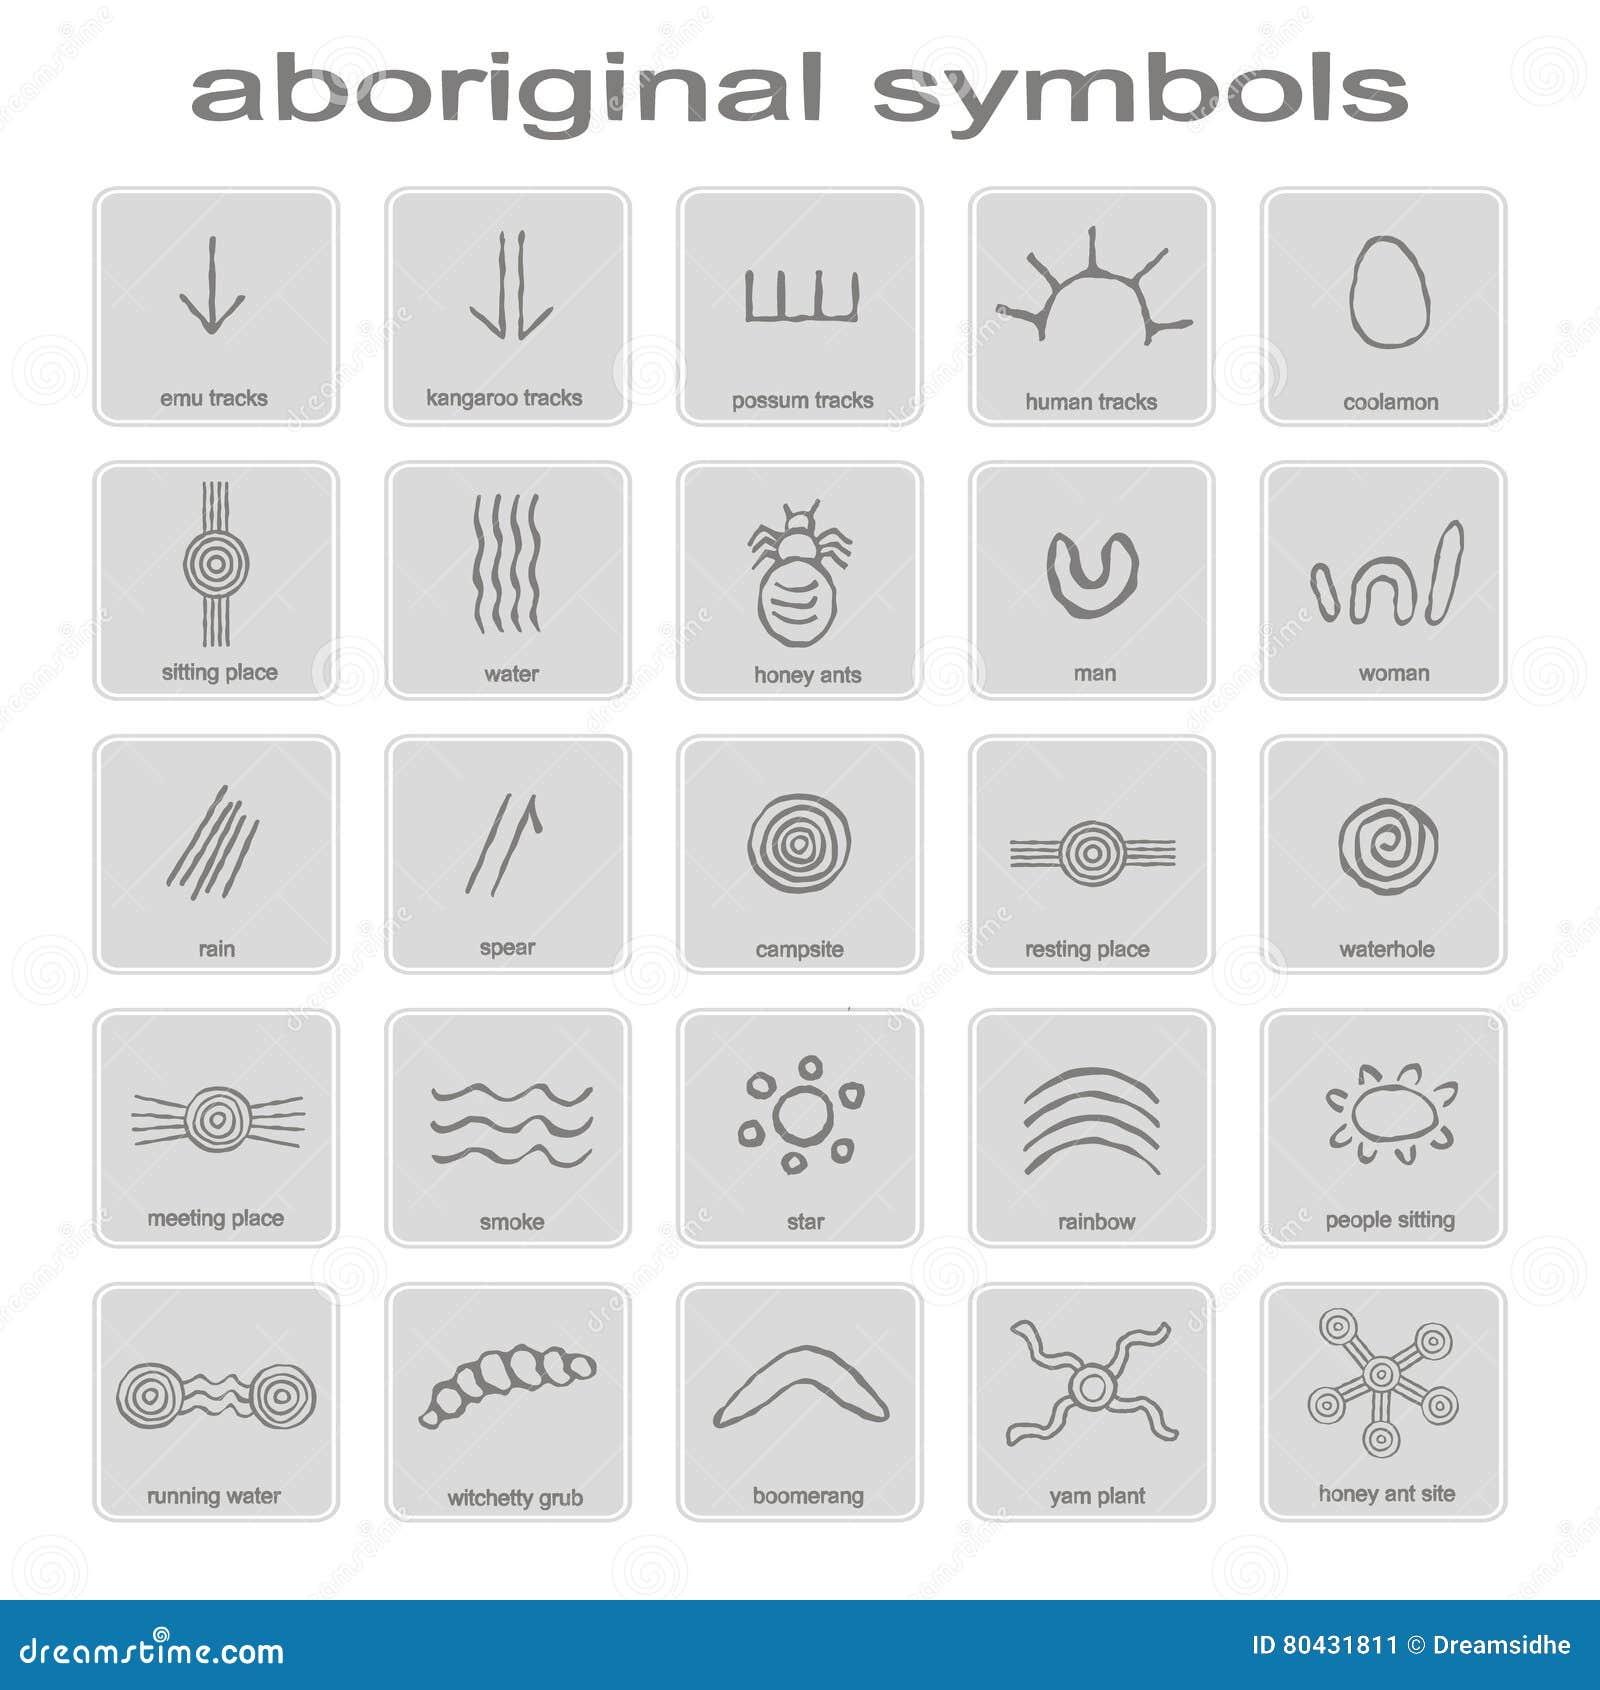 Aboriginal And Torres Strait Islander Symbols